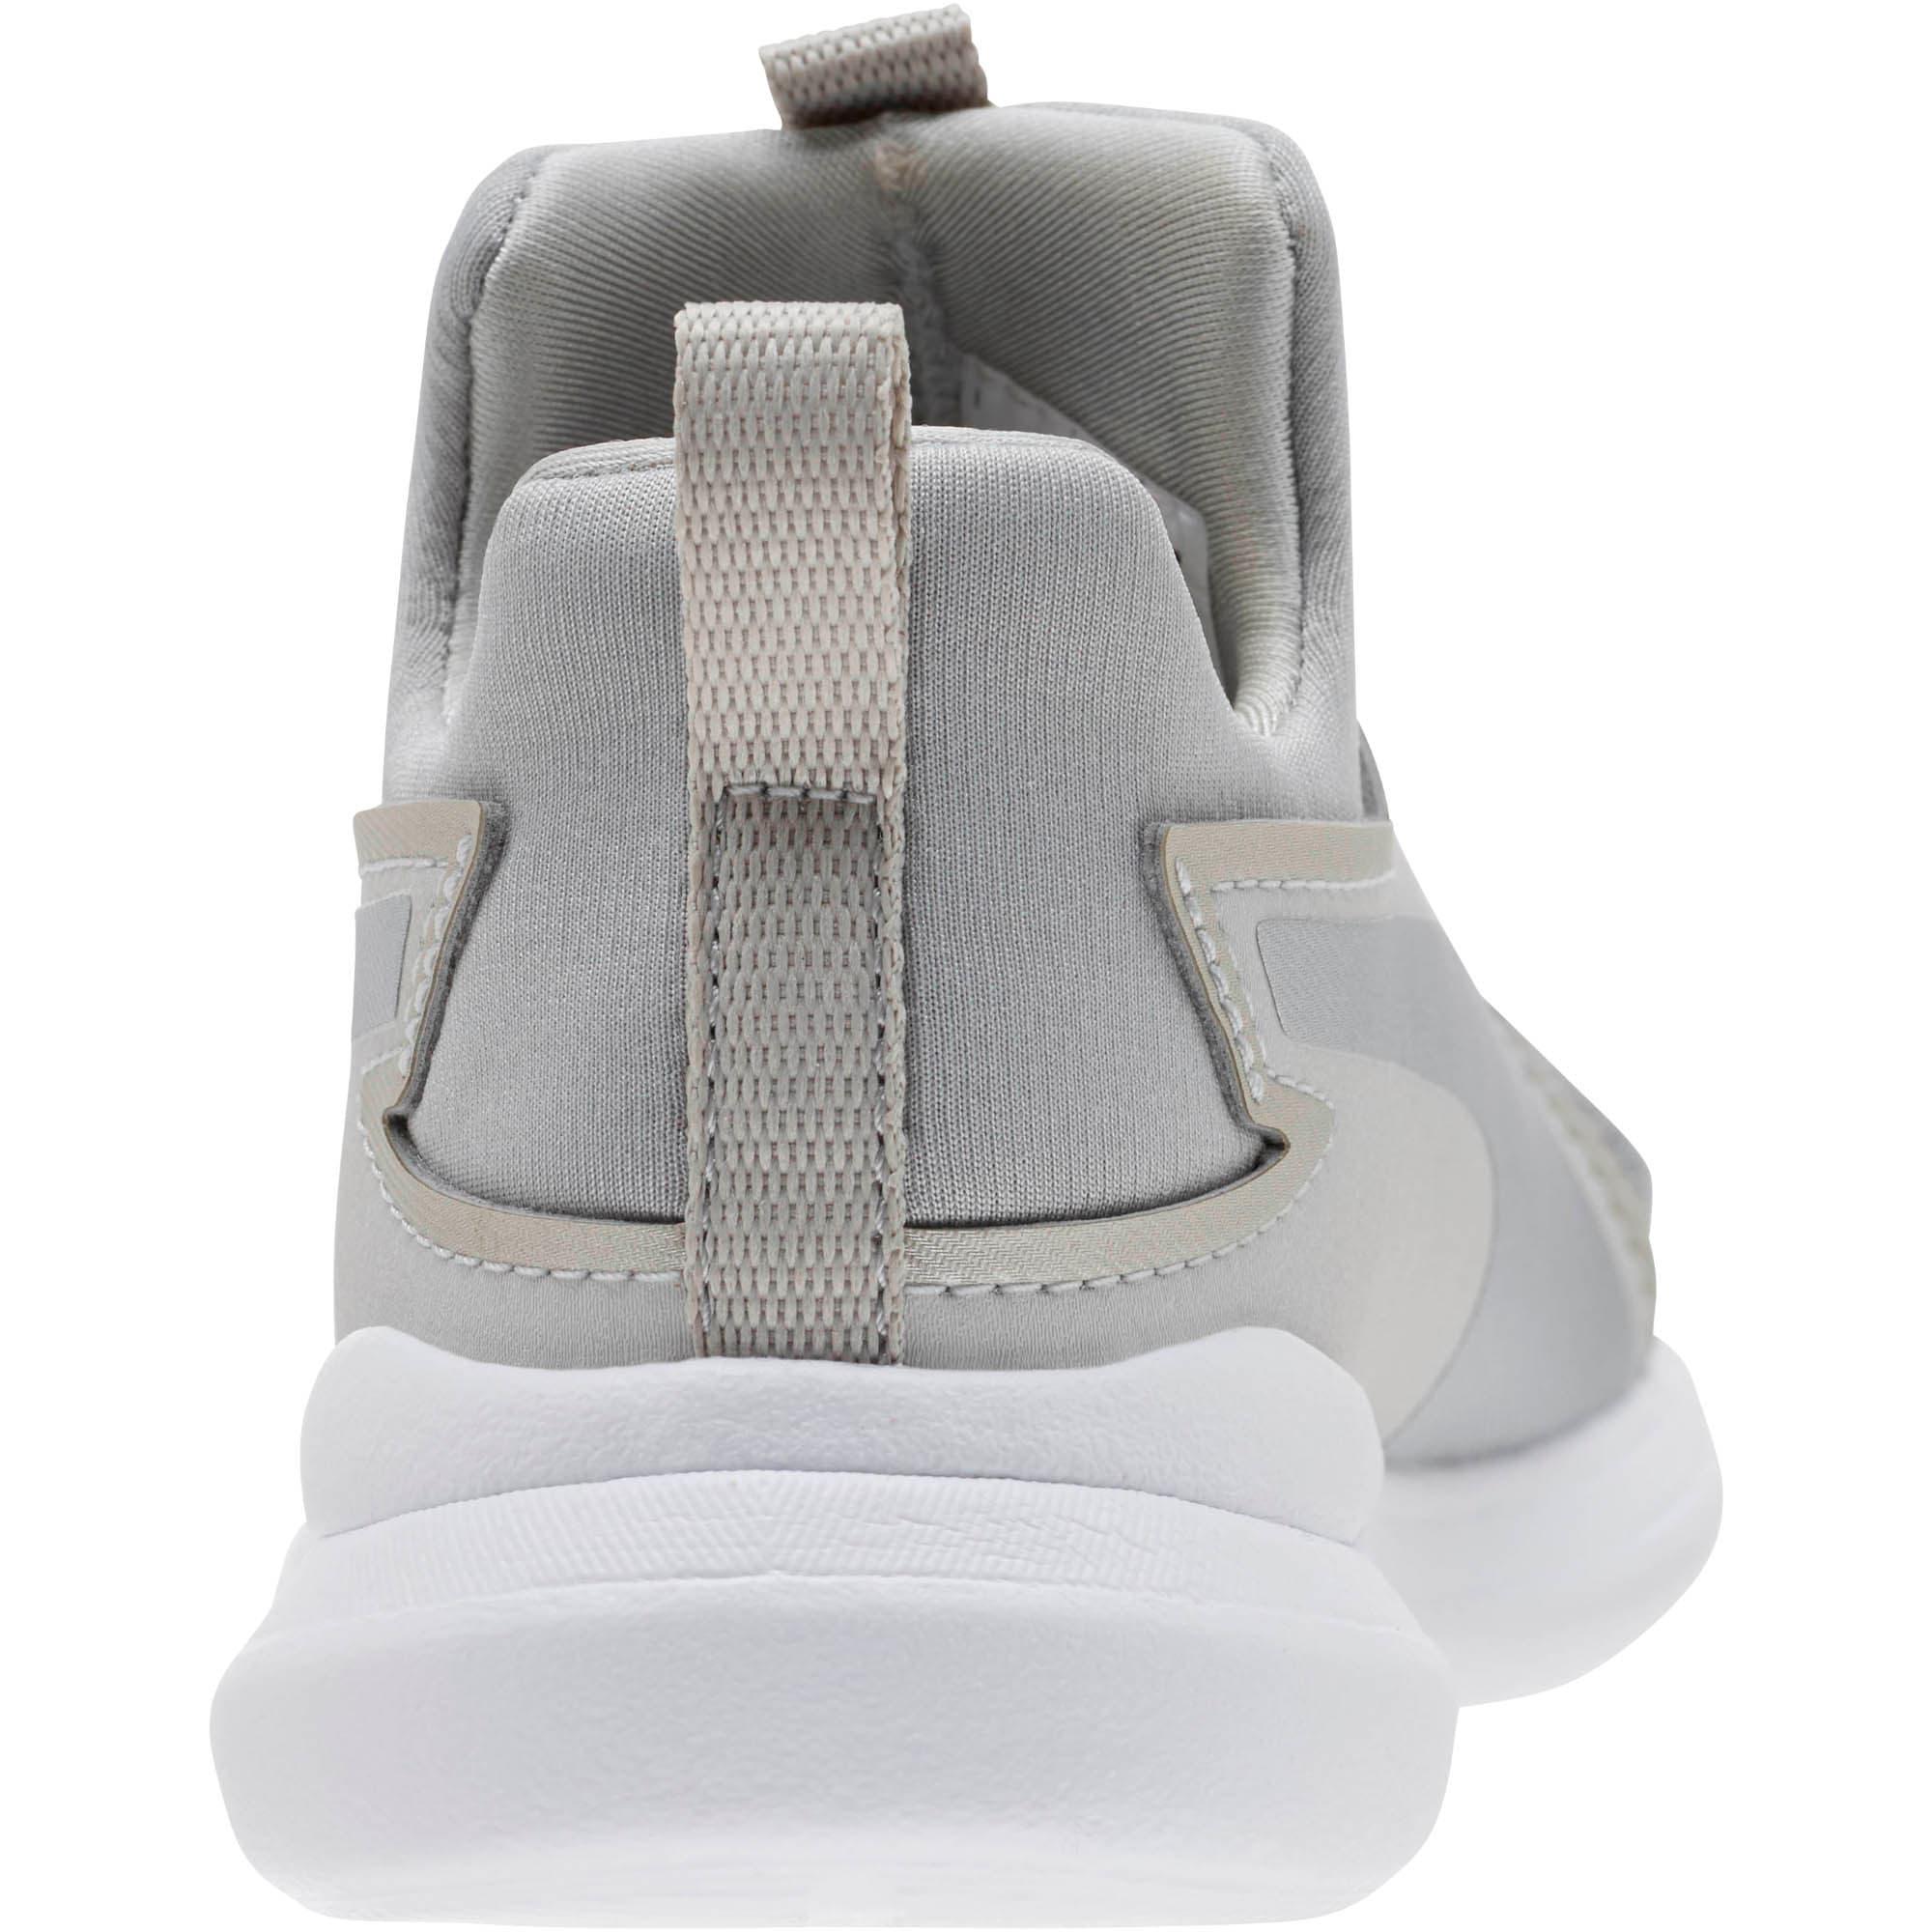 Thumbnail 4 of Puma Rebel Mid Glow Little Kids' Shoes, Gray Violet-Puma Silver, medium